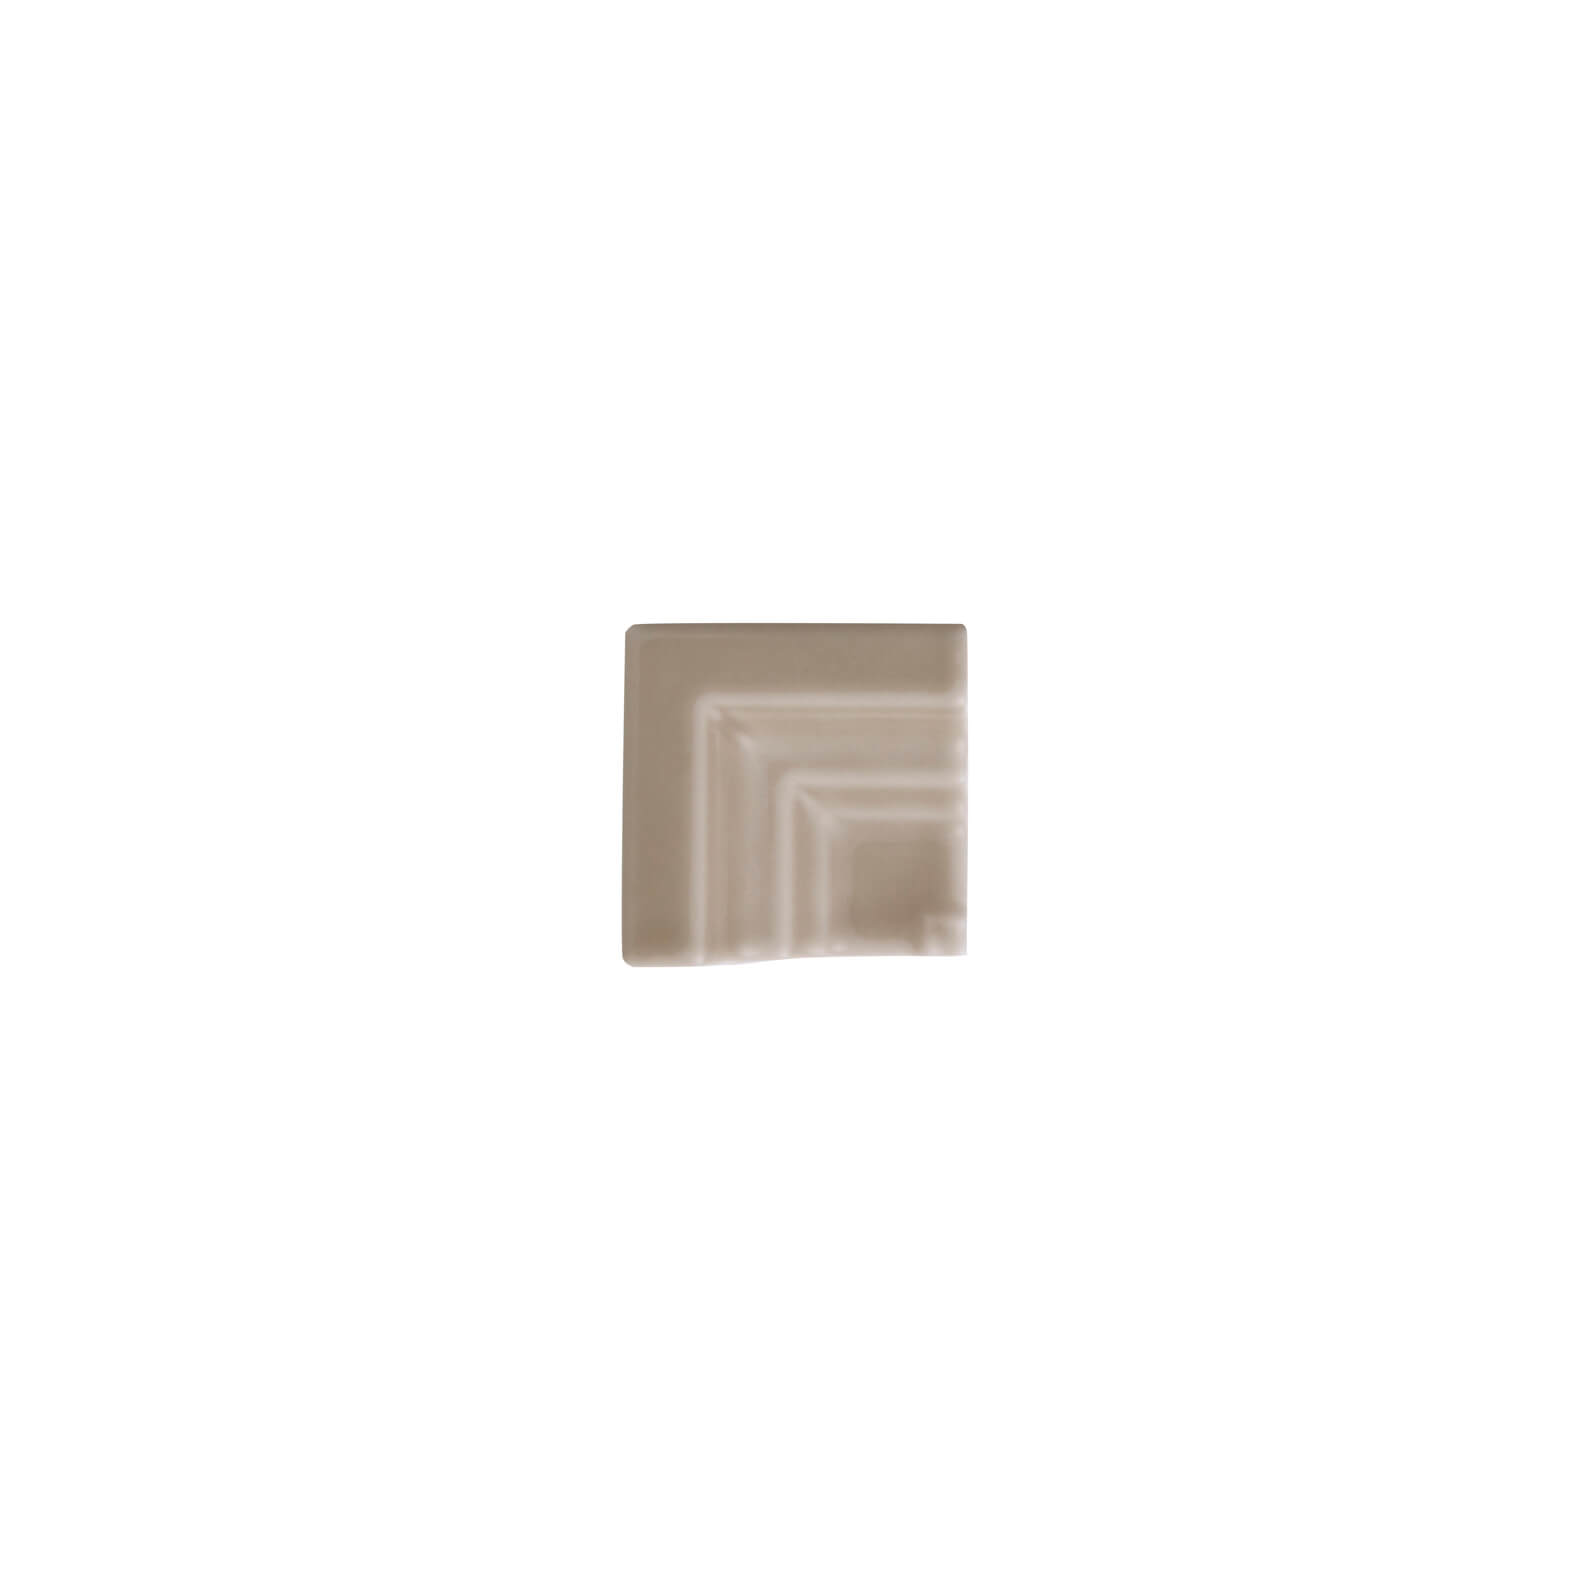 ADEX-ADST5295-ANGULO-MARCO CORNISA  -5 cm-19.8 cm-STUDIO>SILLVER SANDS